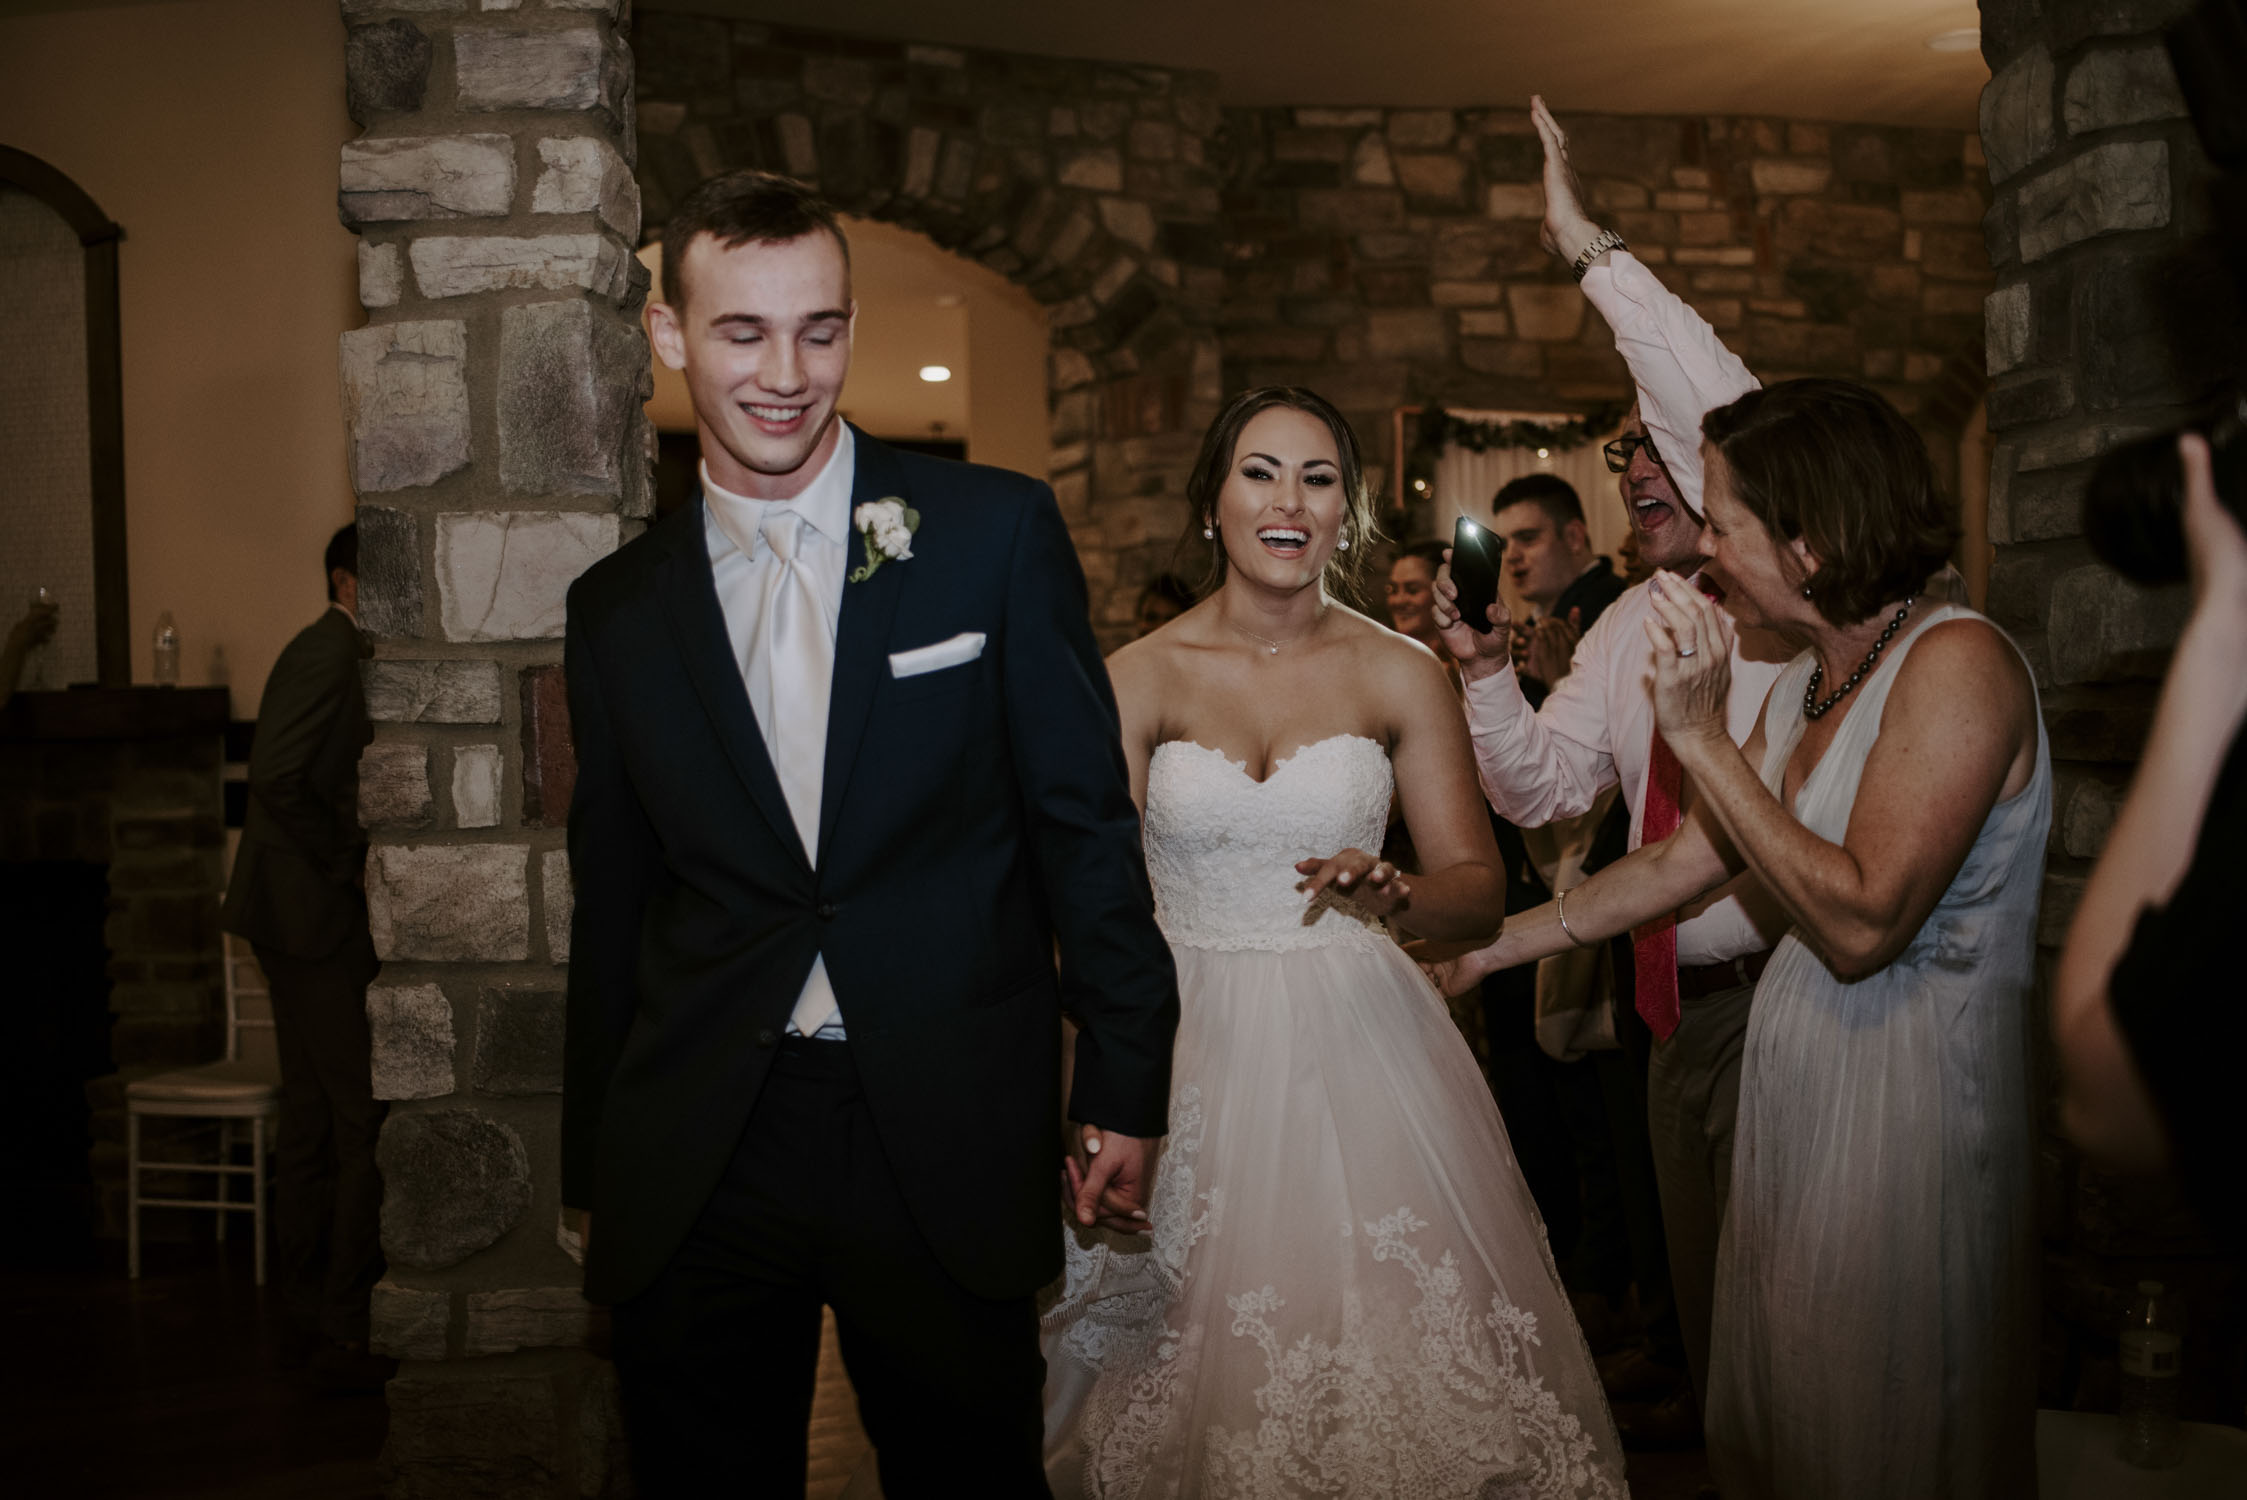 Rainy Bella Collina Wedding - Reception Cake Cutting | Kayli LaFon Photography, Greensboro Winston-Salem NC Wedding Photographer